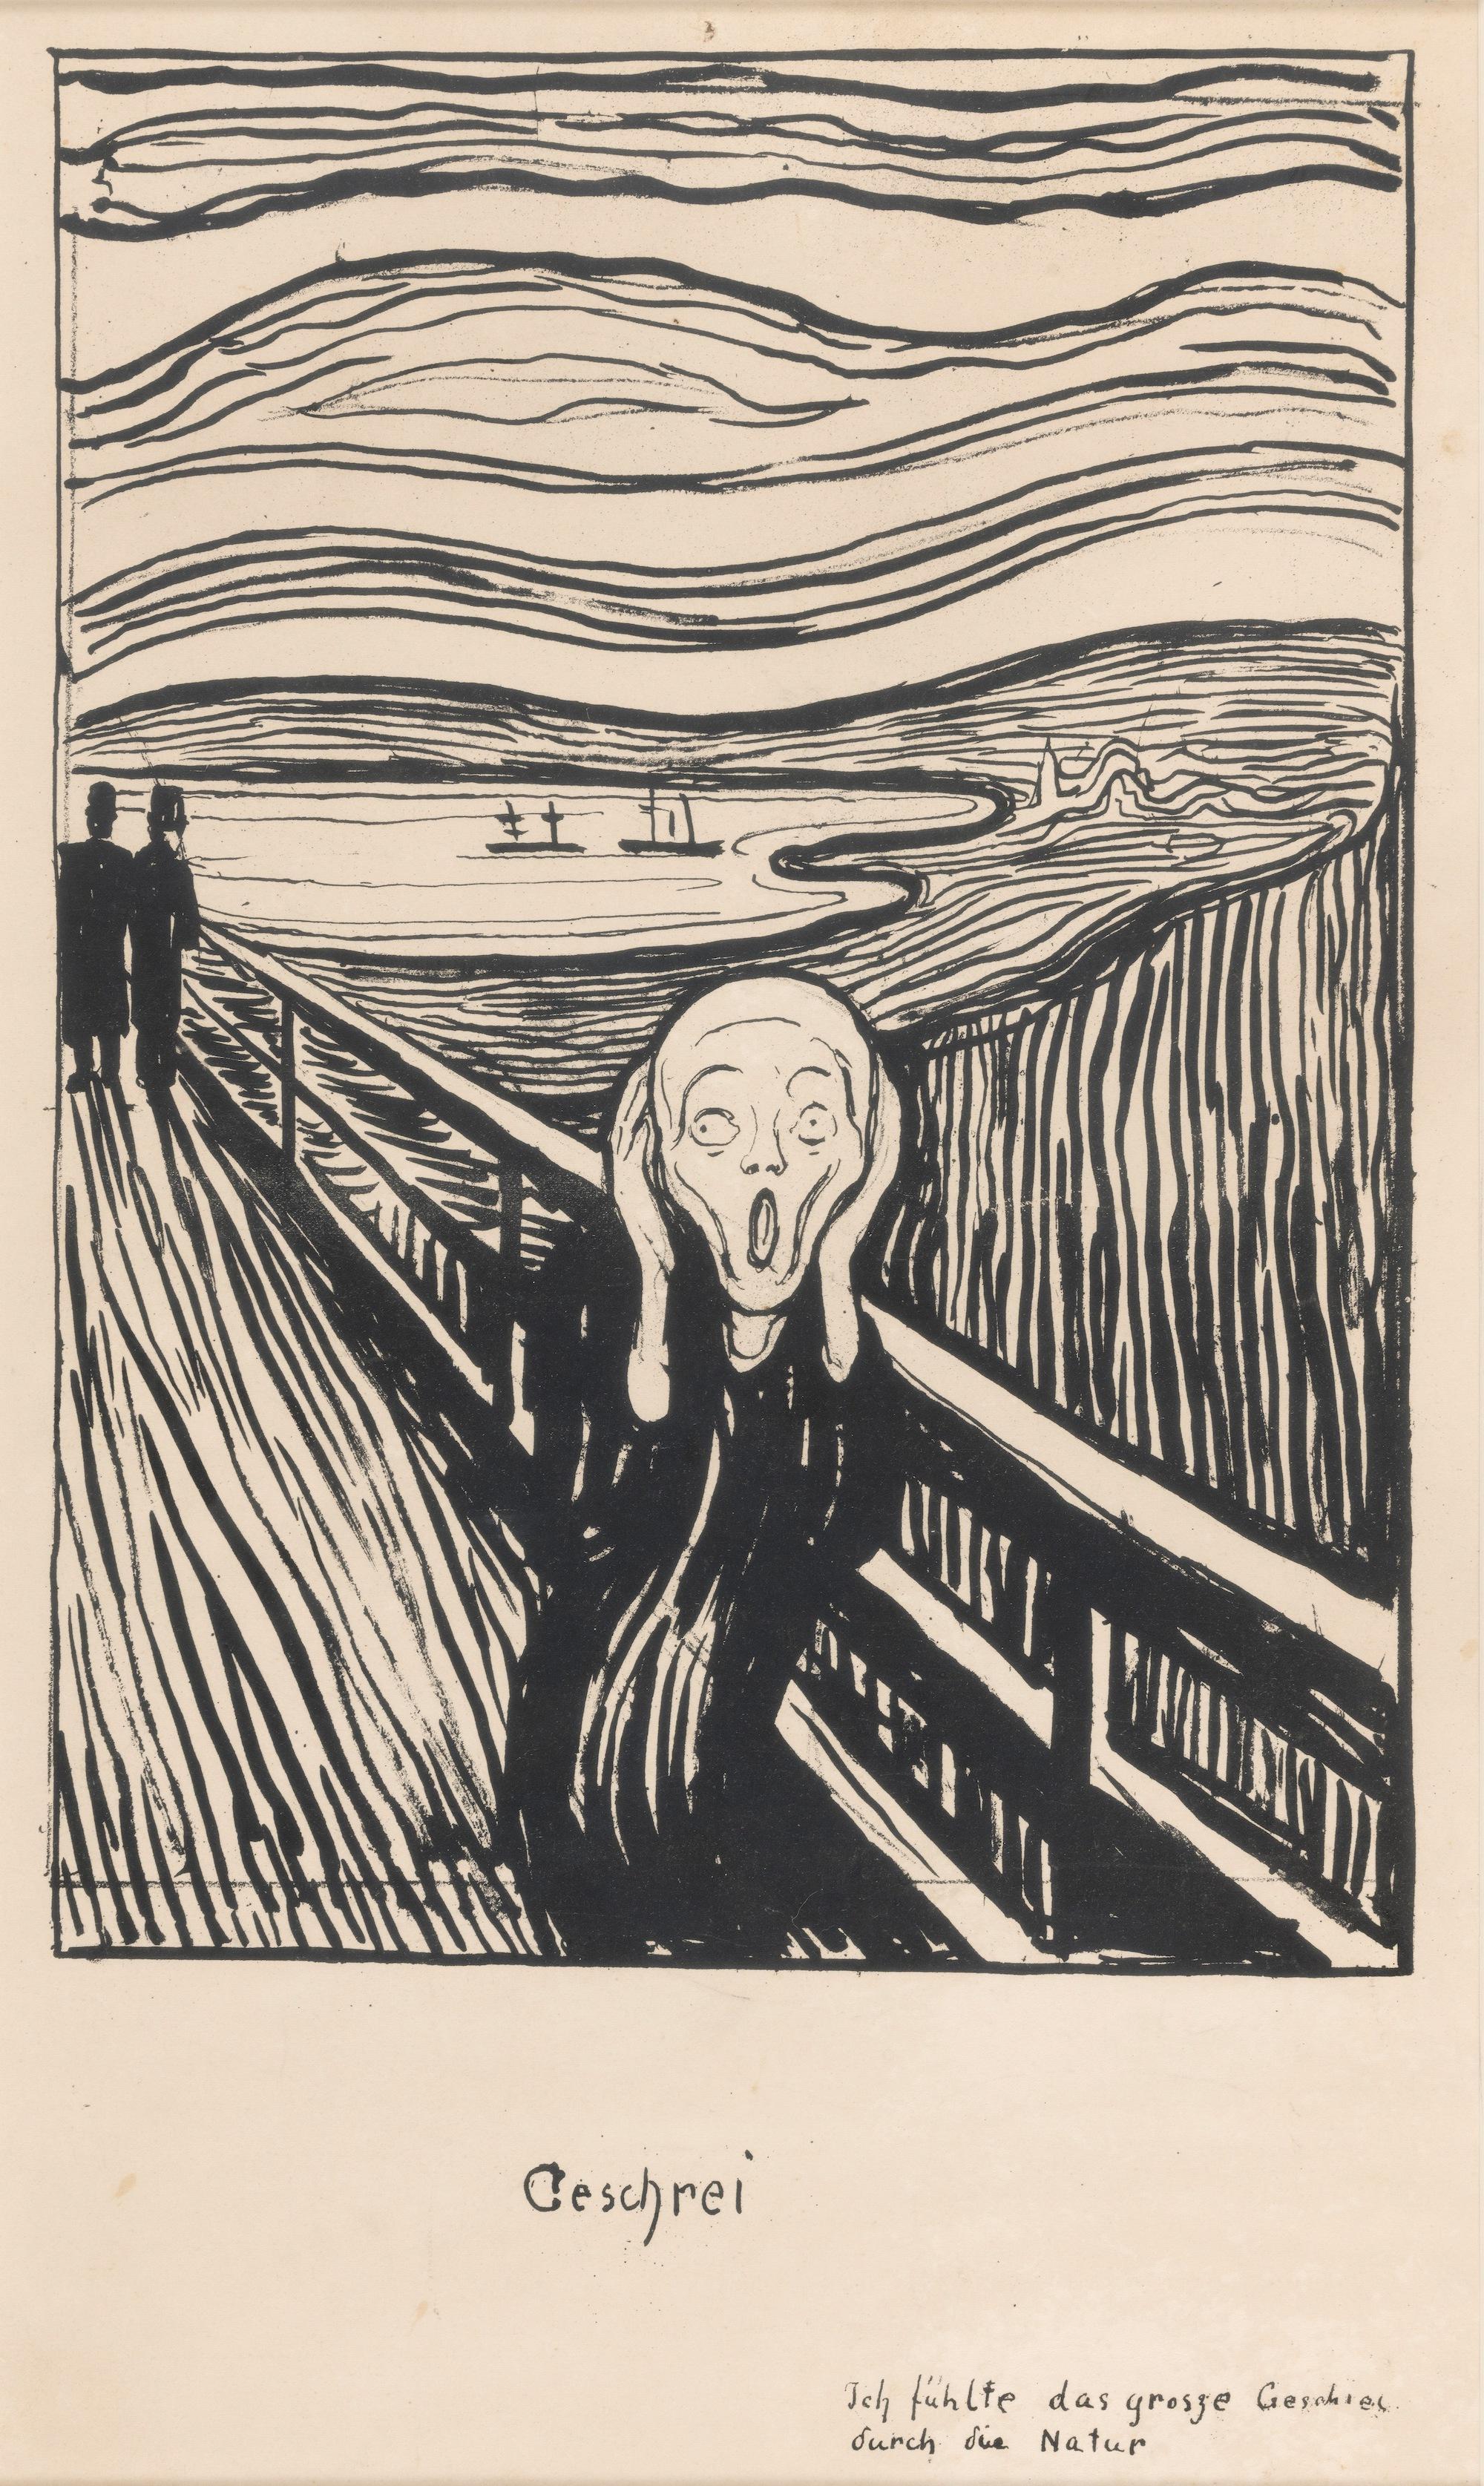 The Scream By Edvard Munch Saved Me In My Darkest Depression Elephant